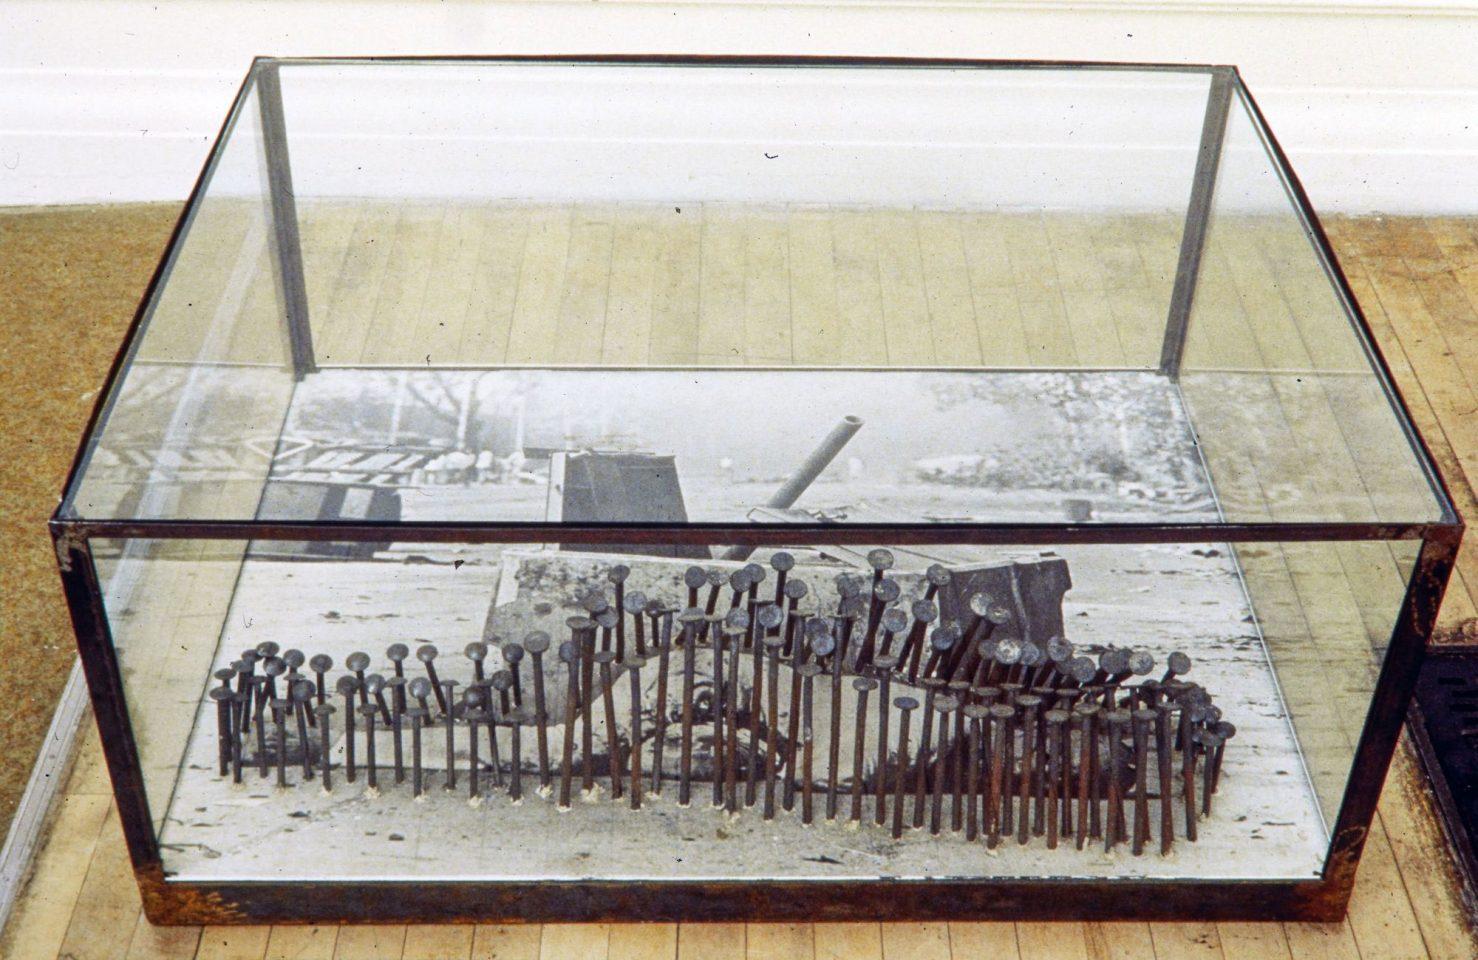 Installation view of Vivan Sundaram's Map, Monument, Fallen Mortal.